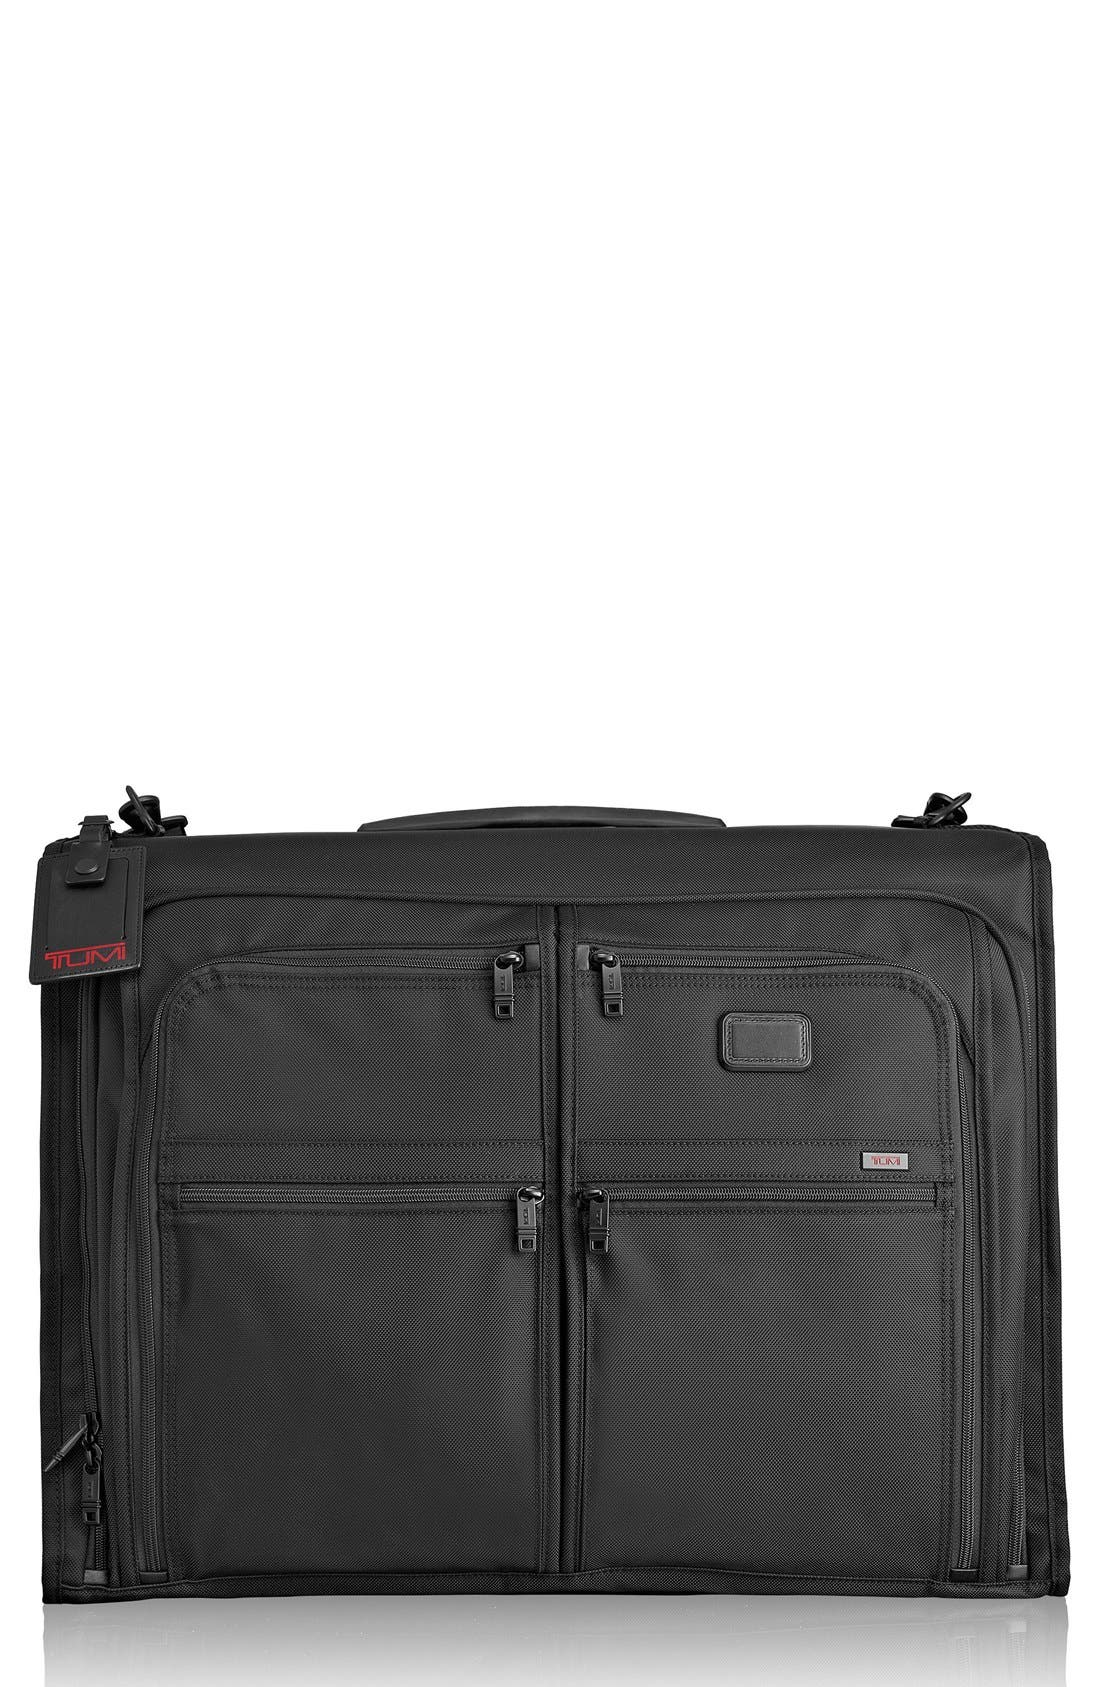 Main Image - Tumi 'Alpha 2' Classic Garment Bag